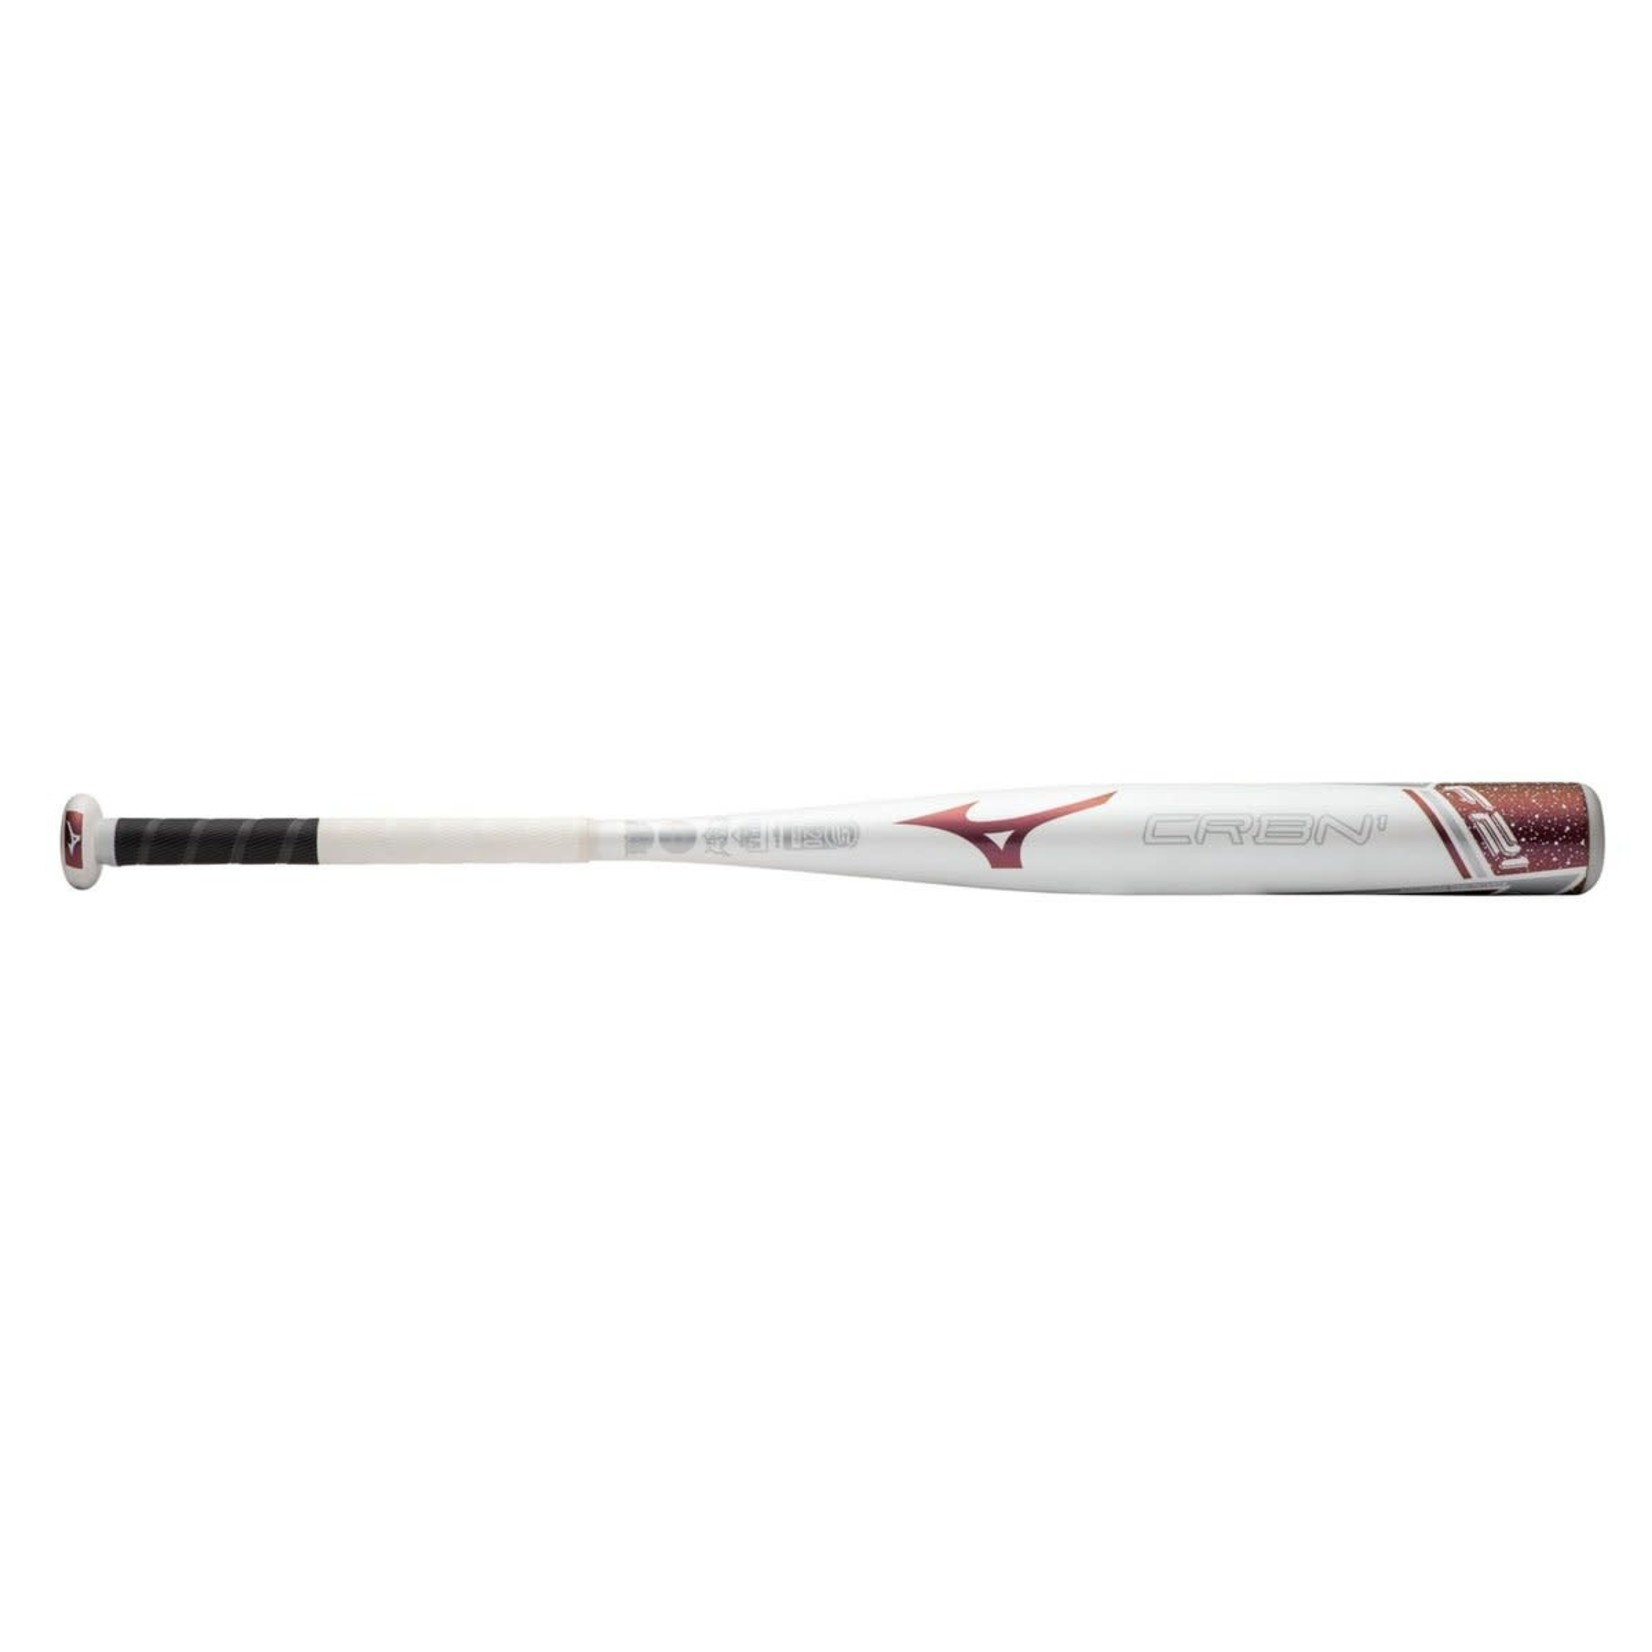 "Mizuno Mizuno Baseball Bat, F21 Carbon 1 Fastpitch, 2 1/4"", -13"